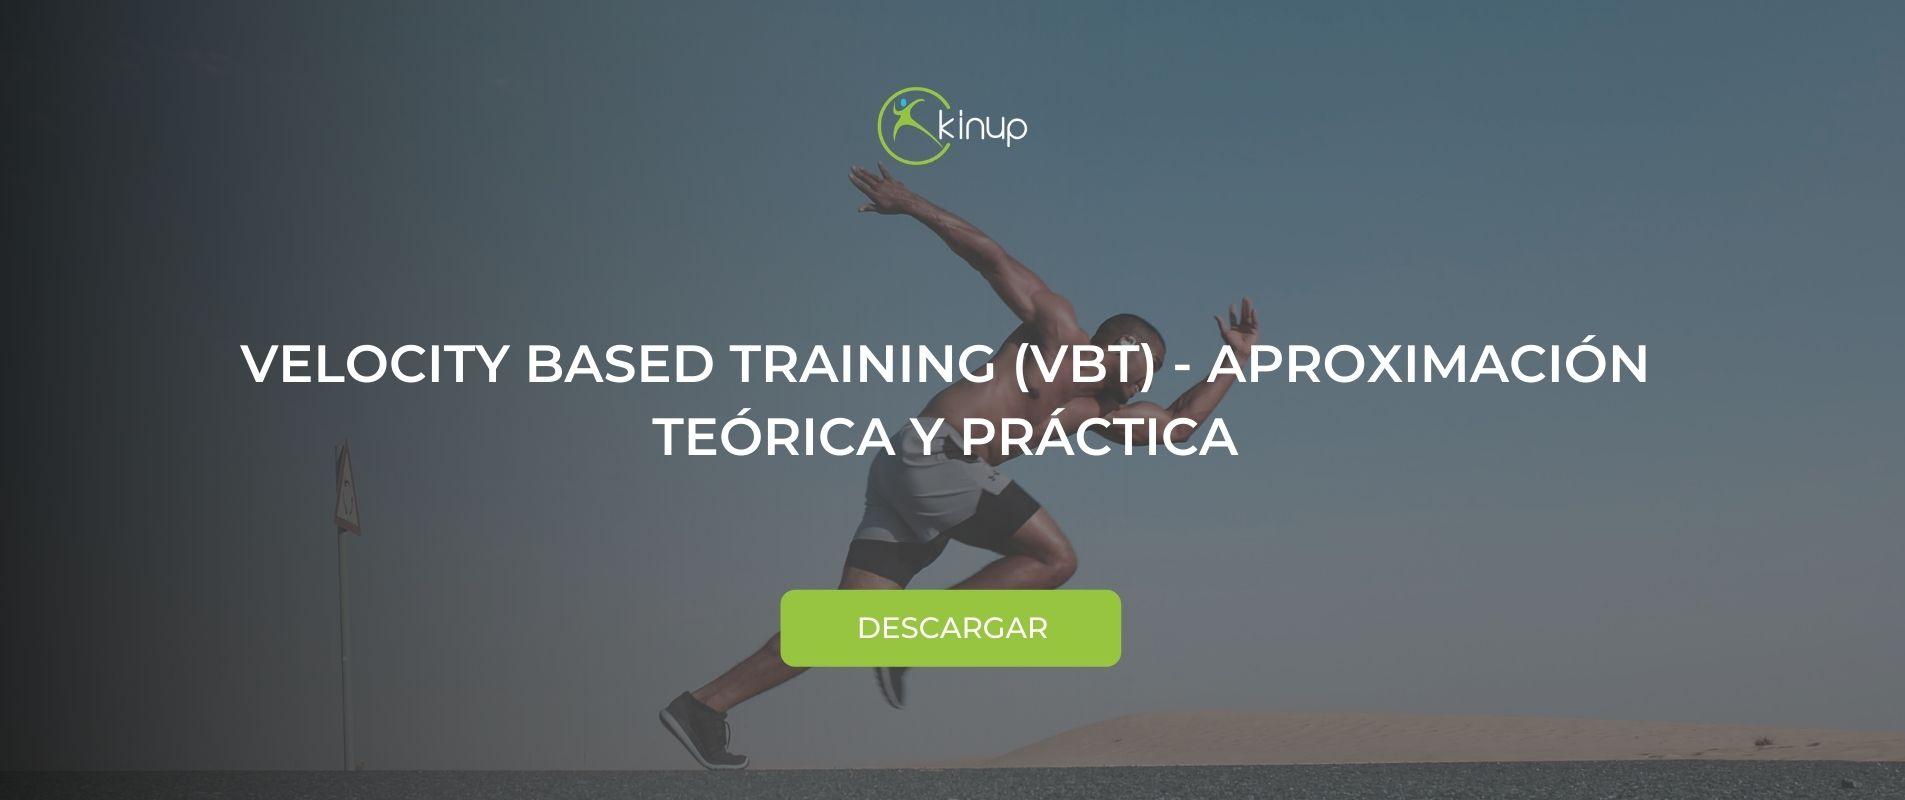 Velocity Based Training (VBY)